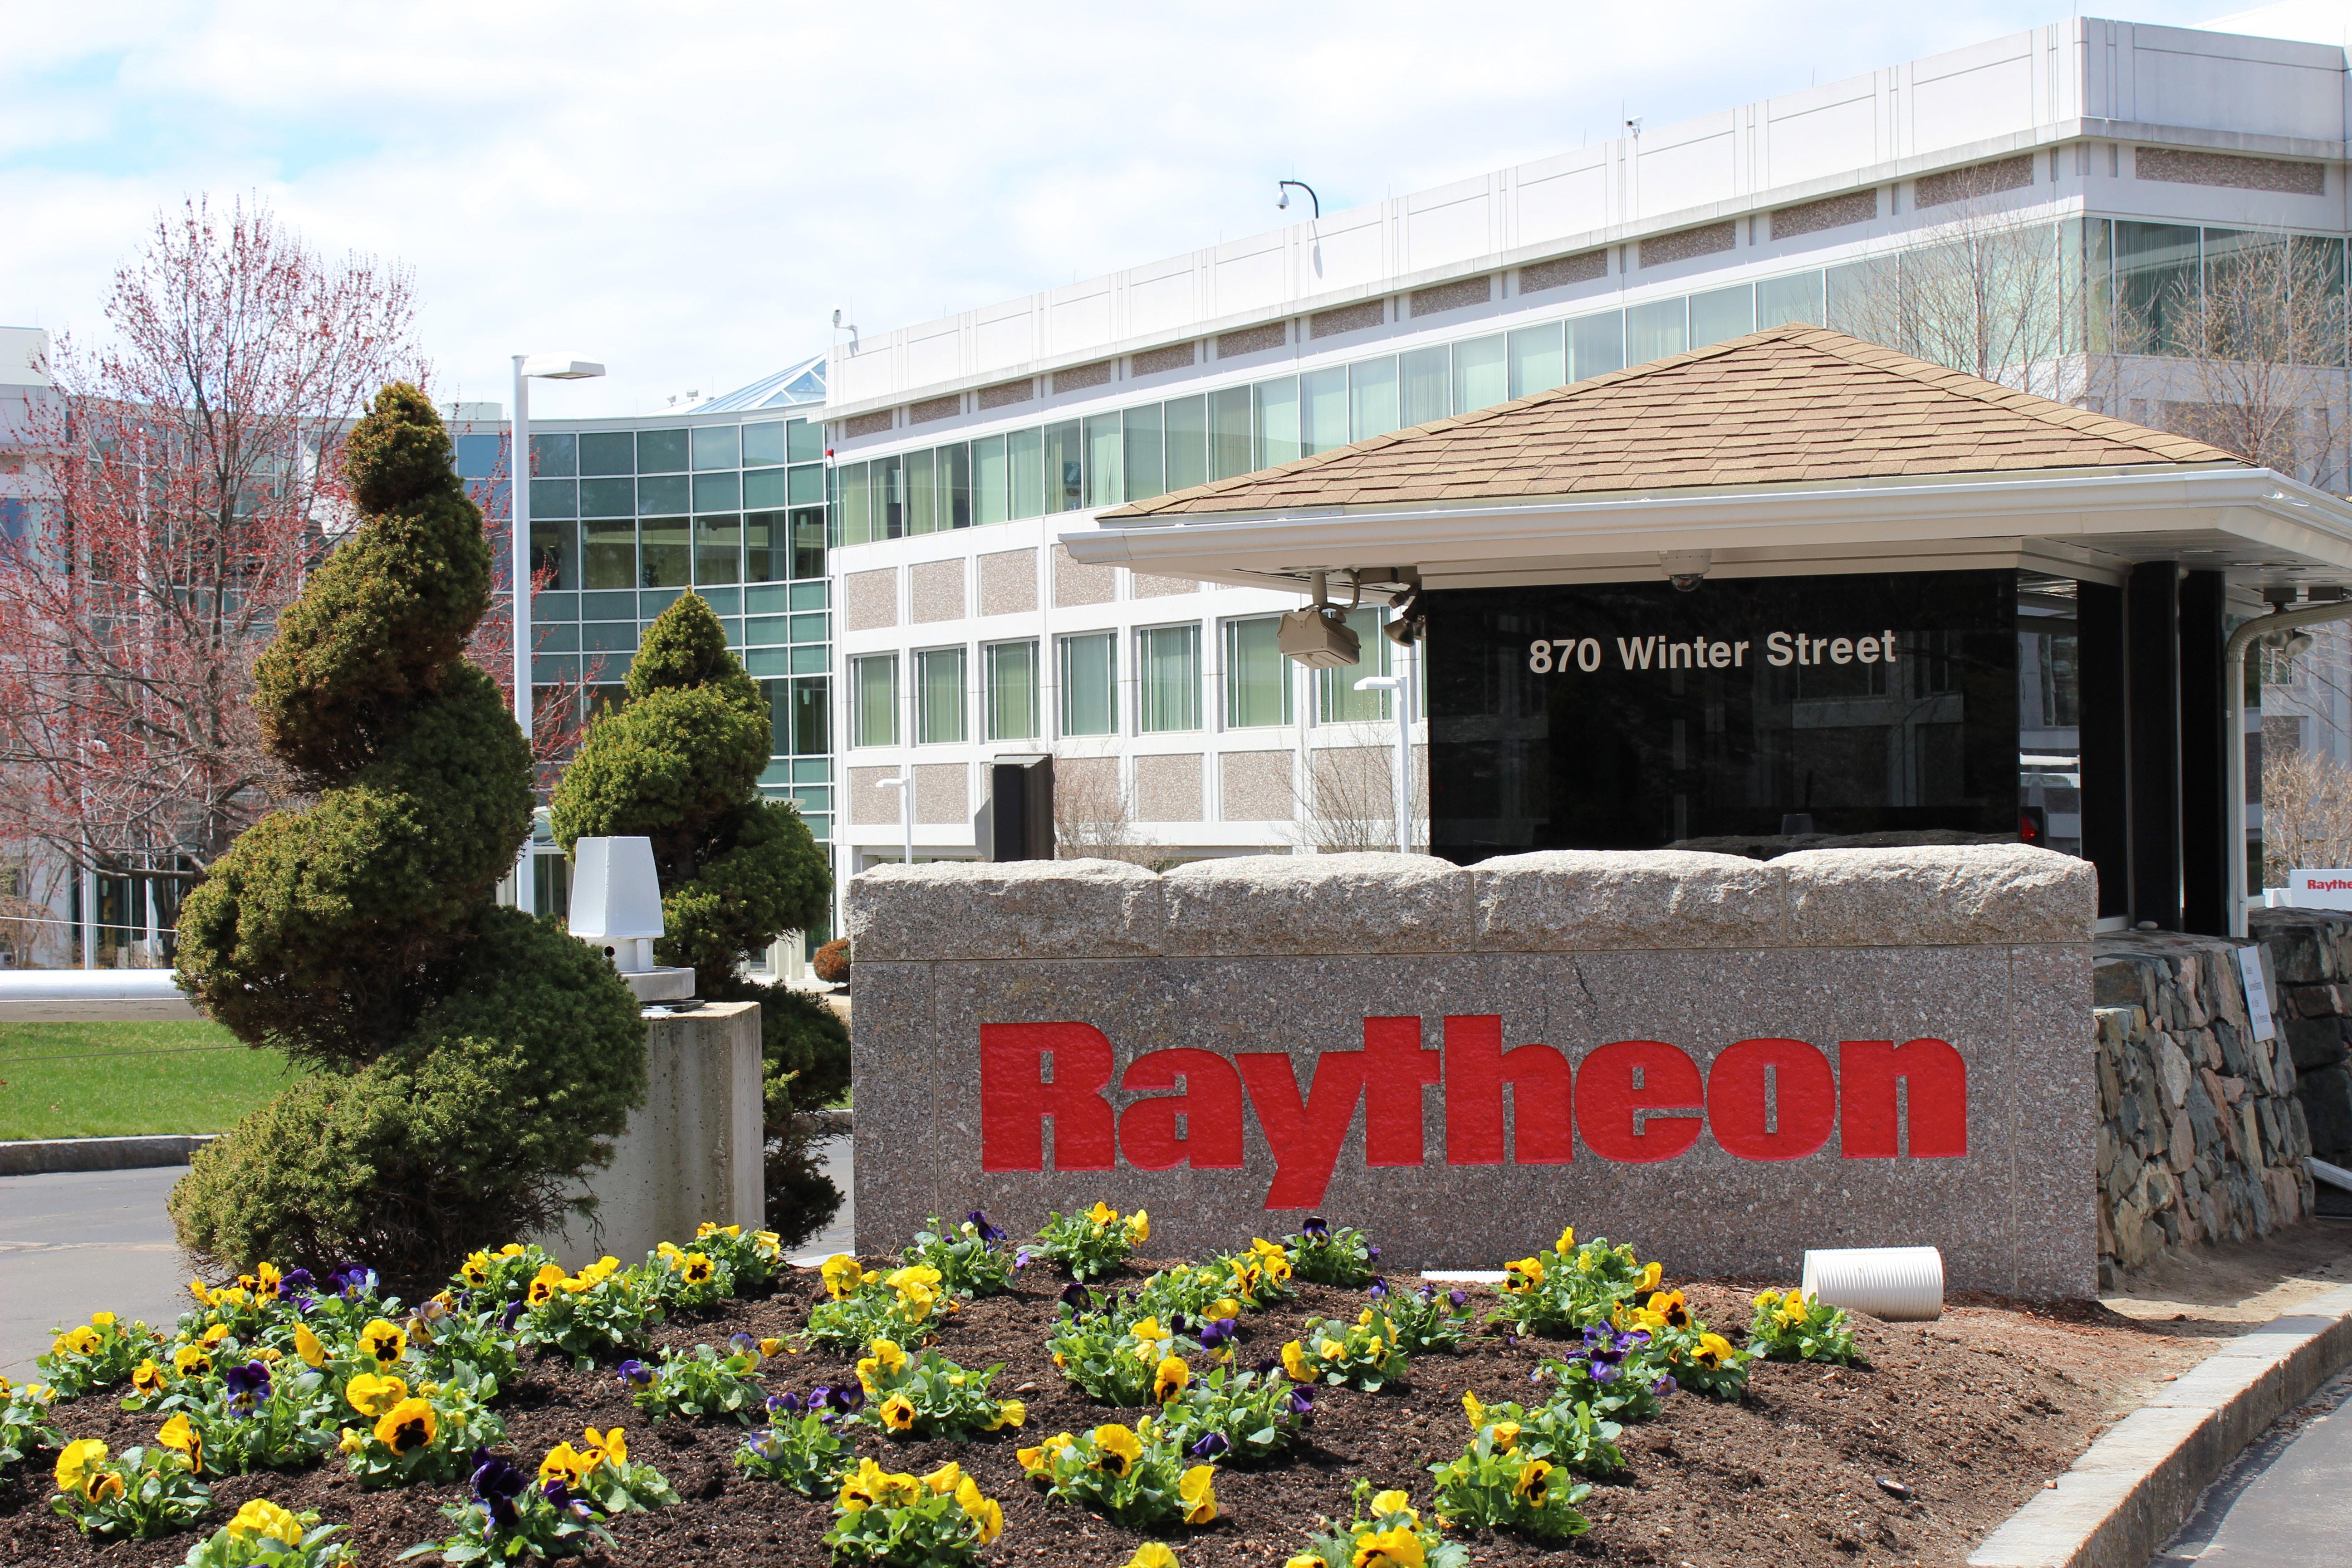 Raytheon headquarters